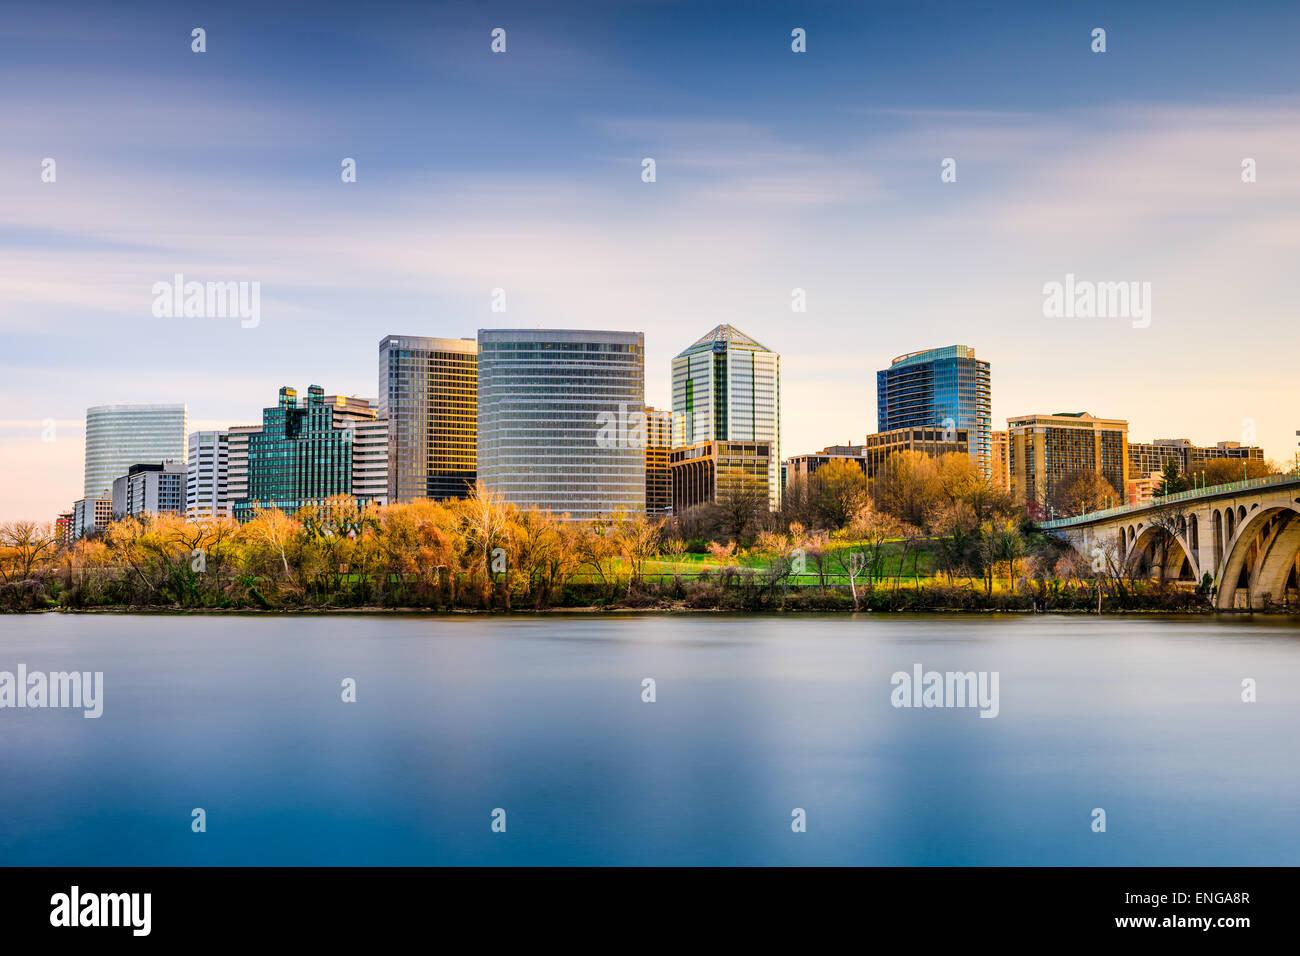 Rosslyn, Arlington, Virginia, USA city skyline on the Potomac River. - Stock Image